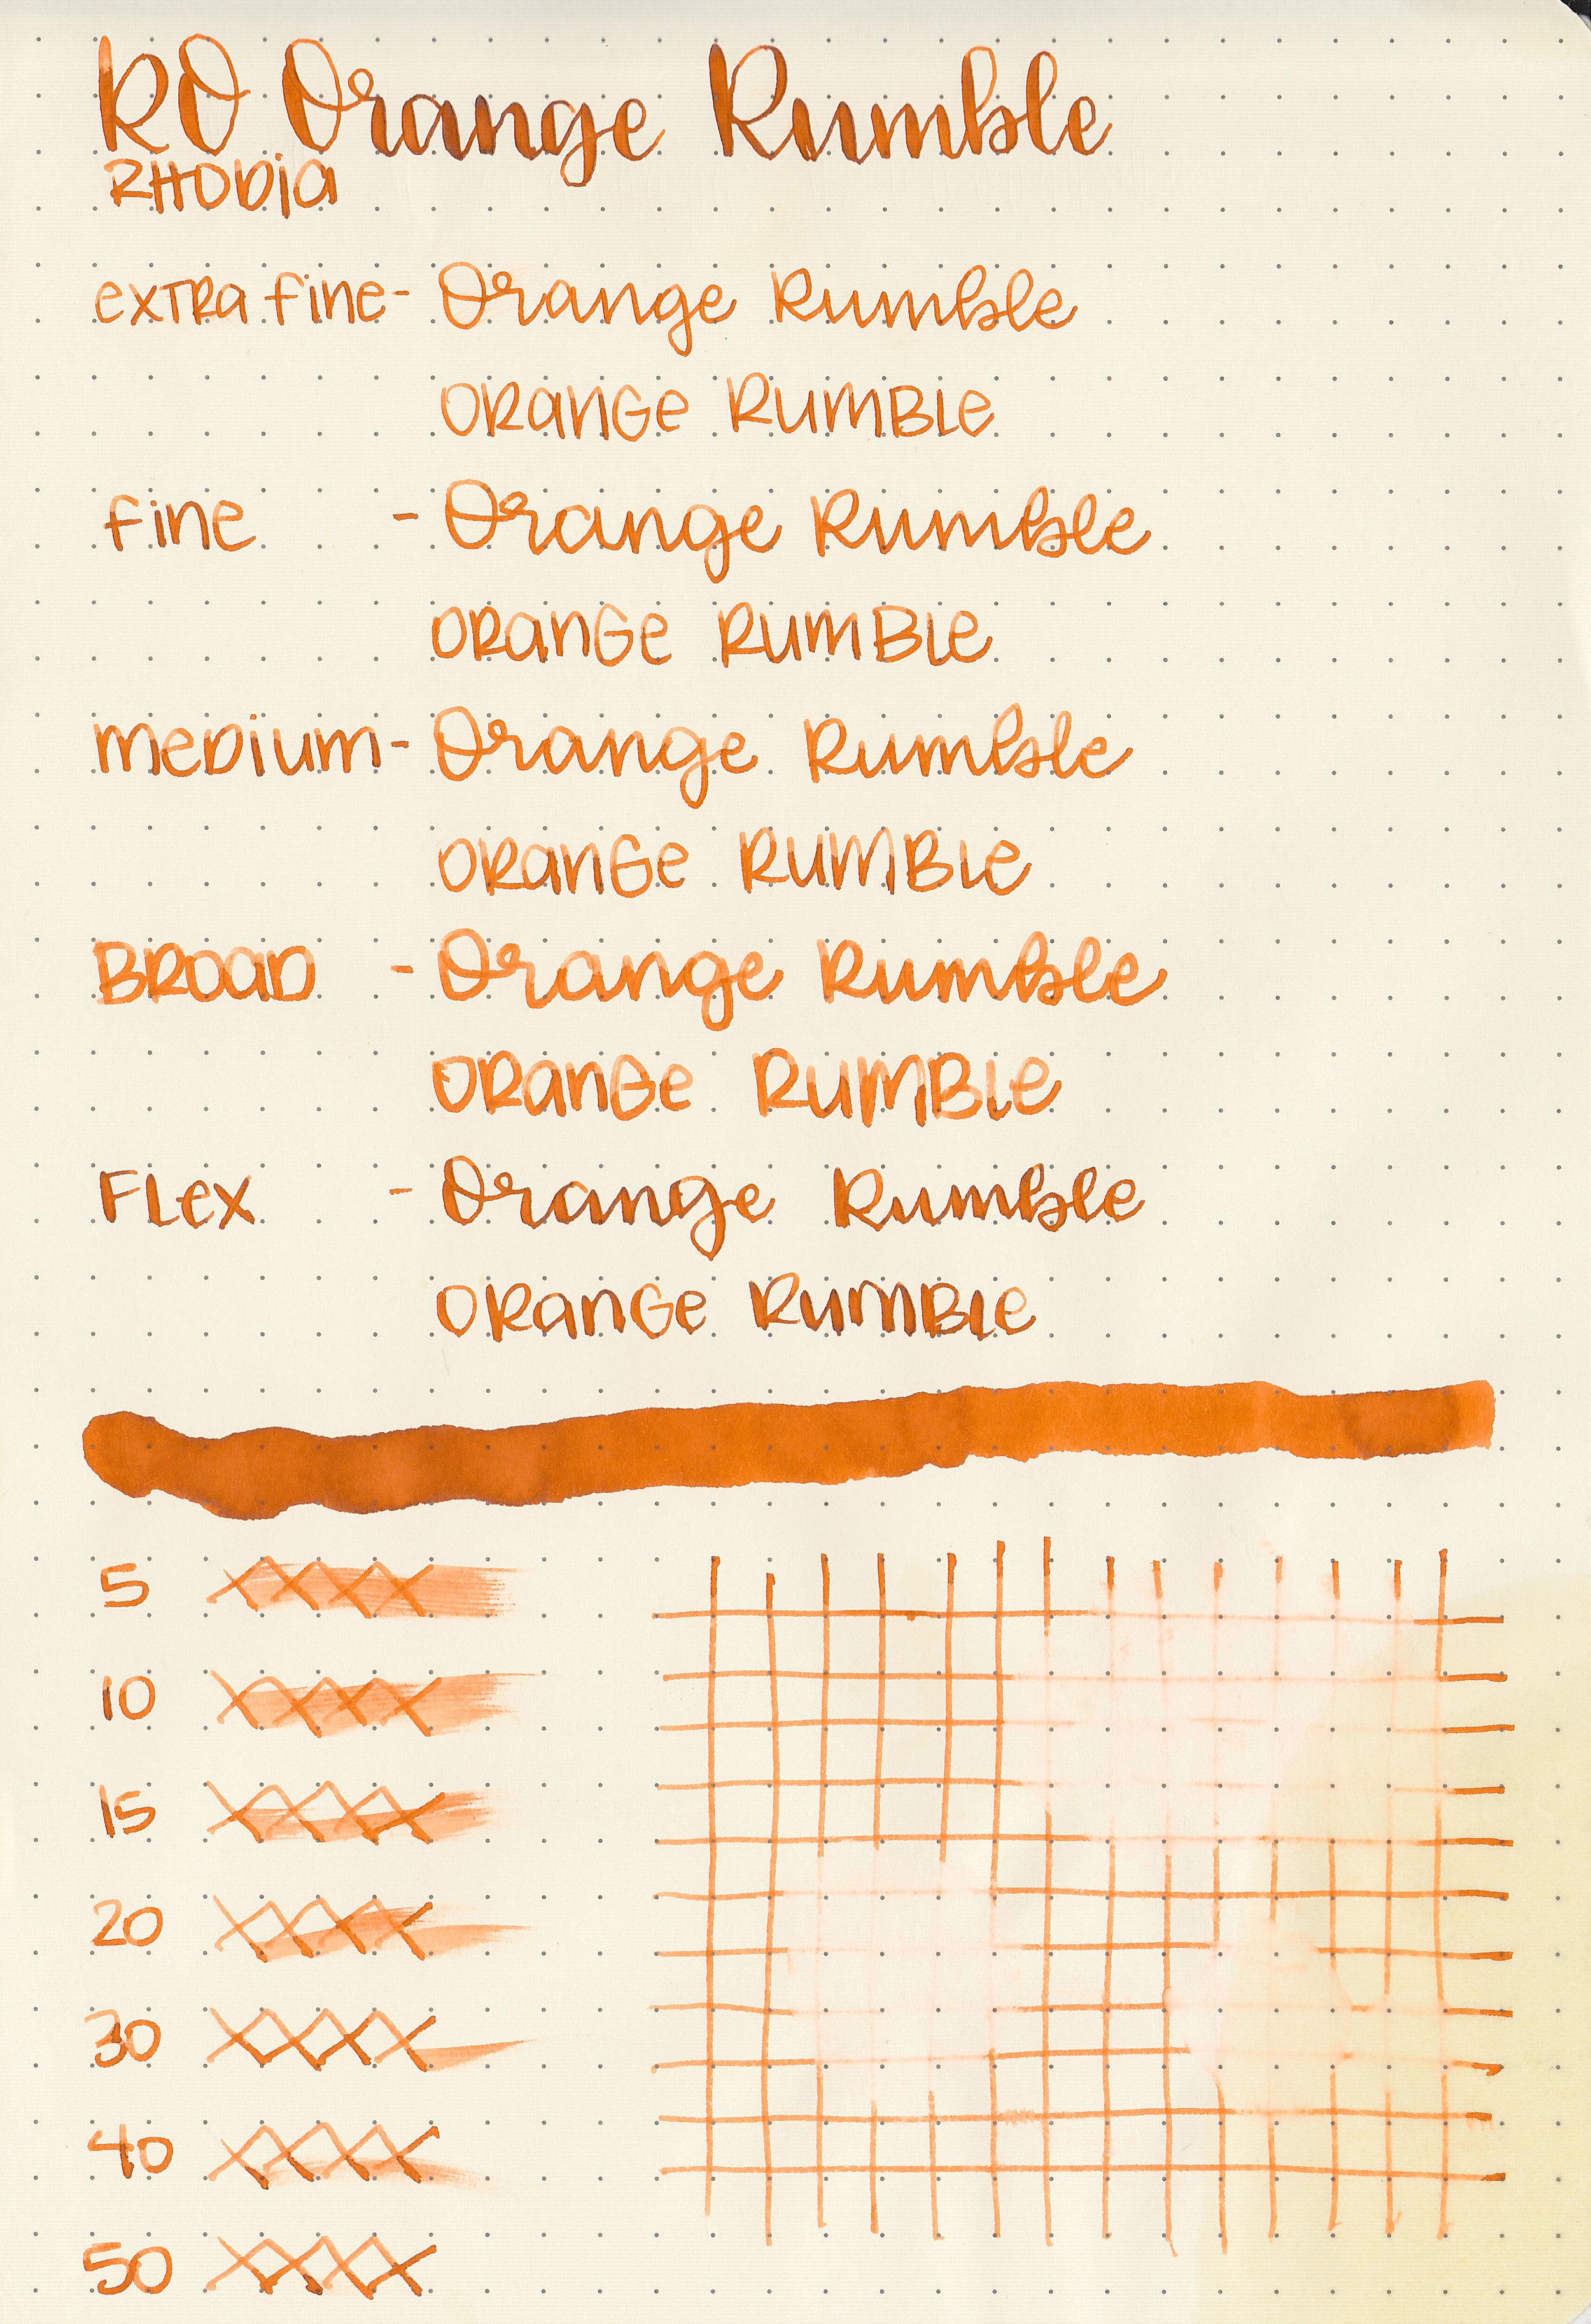 ro-orange-rumble-5.jpg